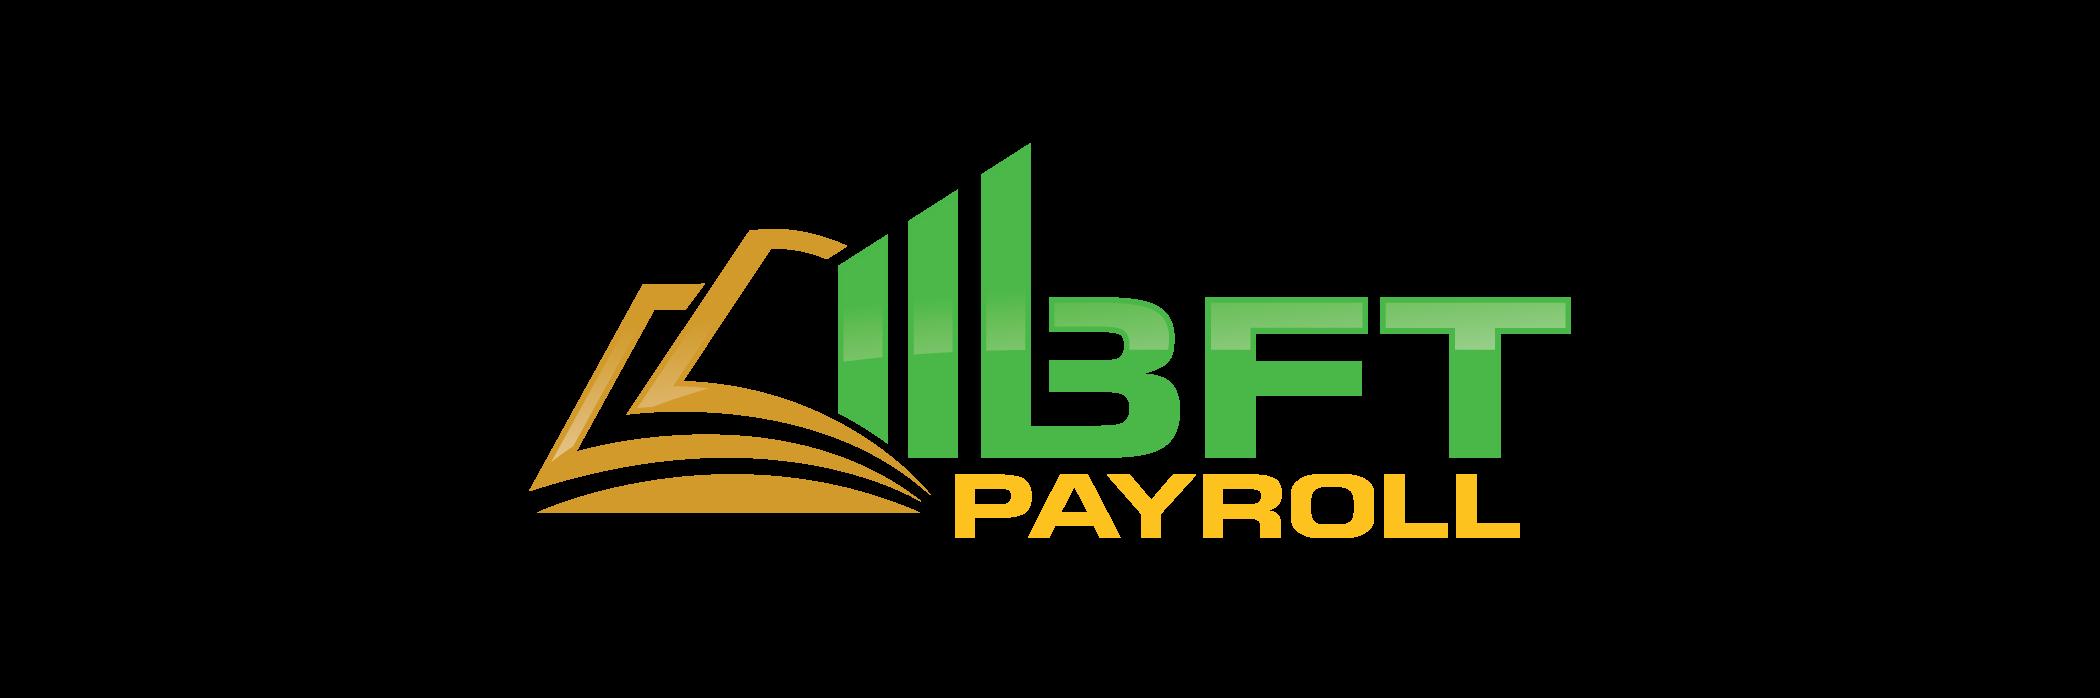 BFT Payroll